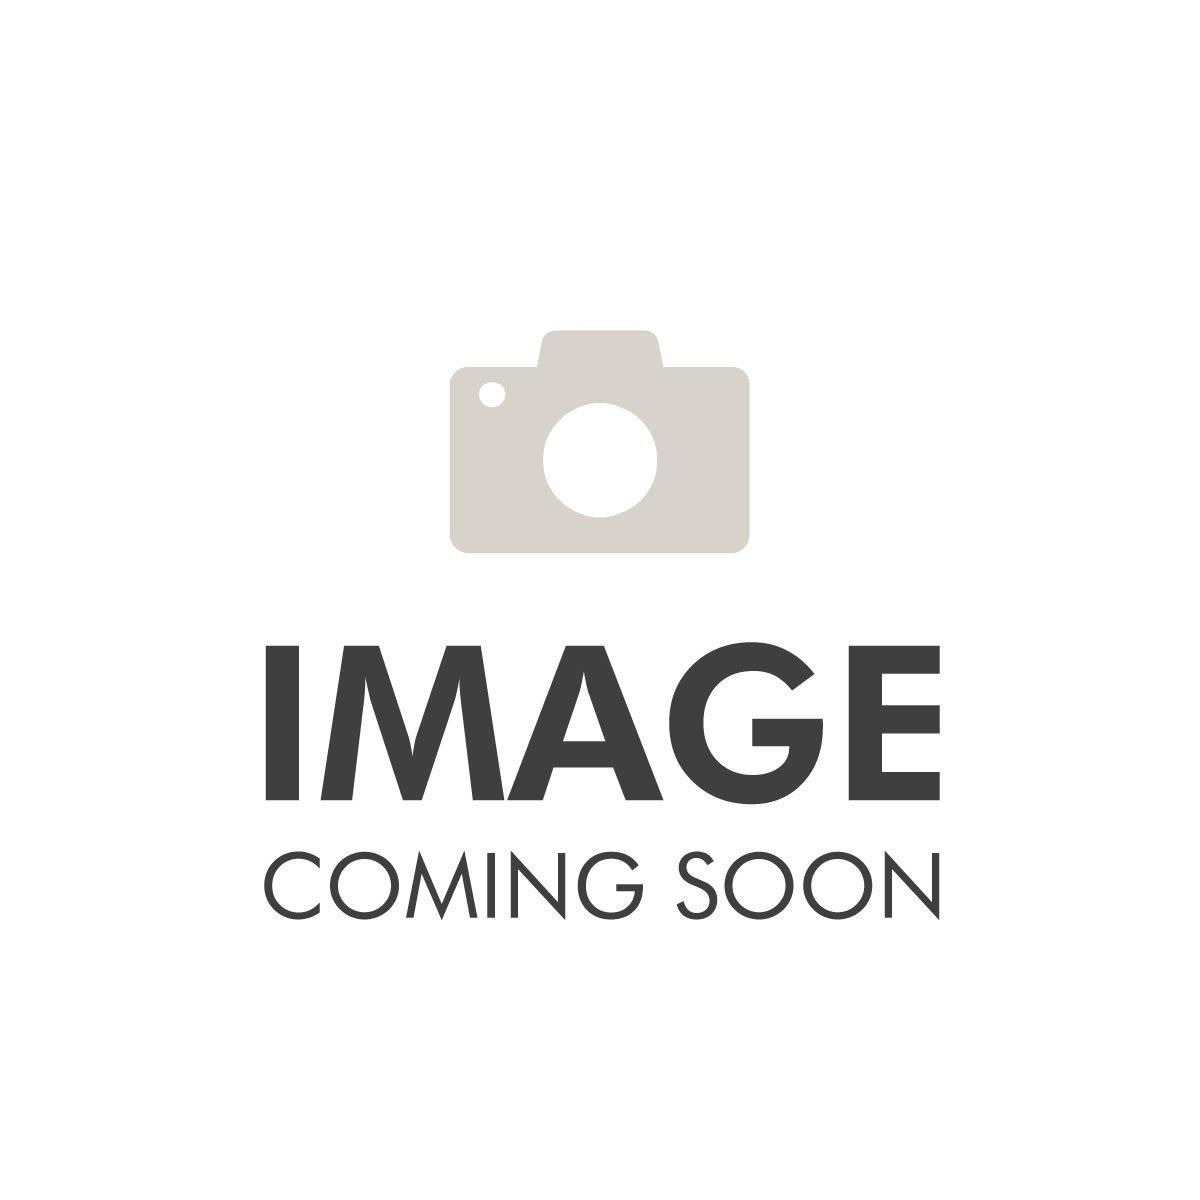 Christian Dior Diorshow Iconic Lash Curler Mascara 090 (Black) 10ml